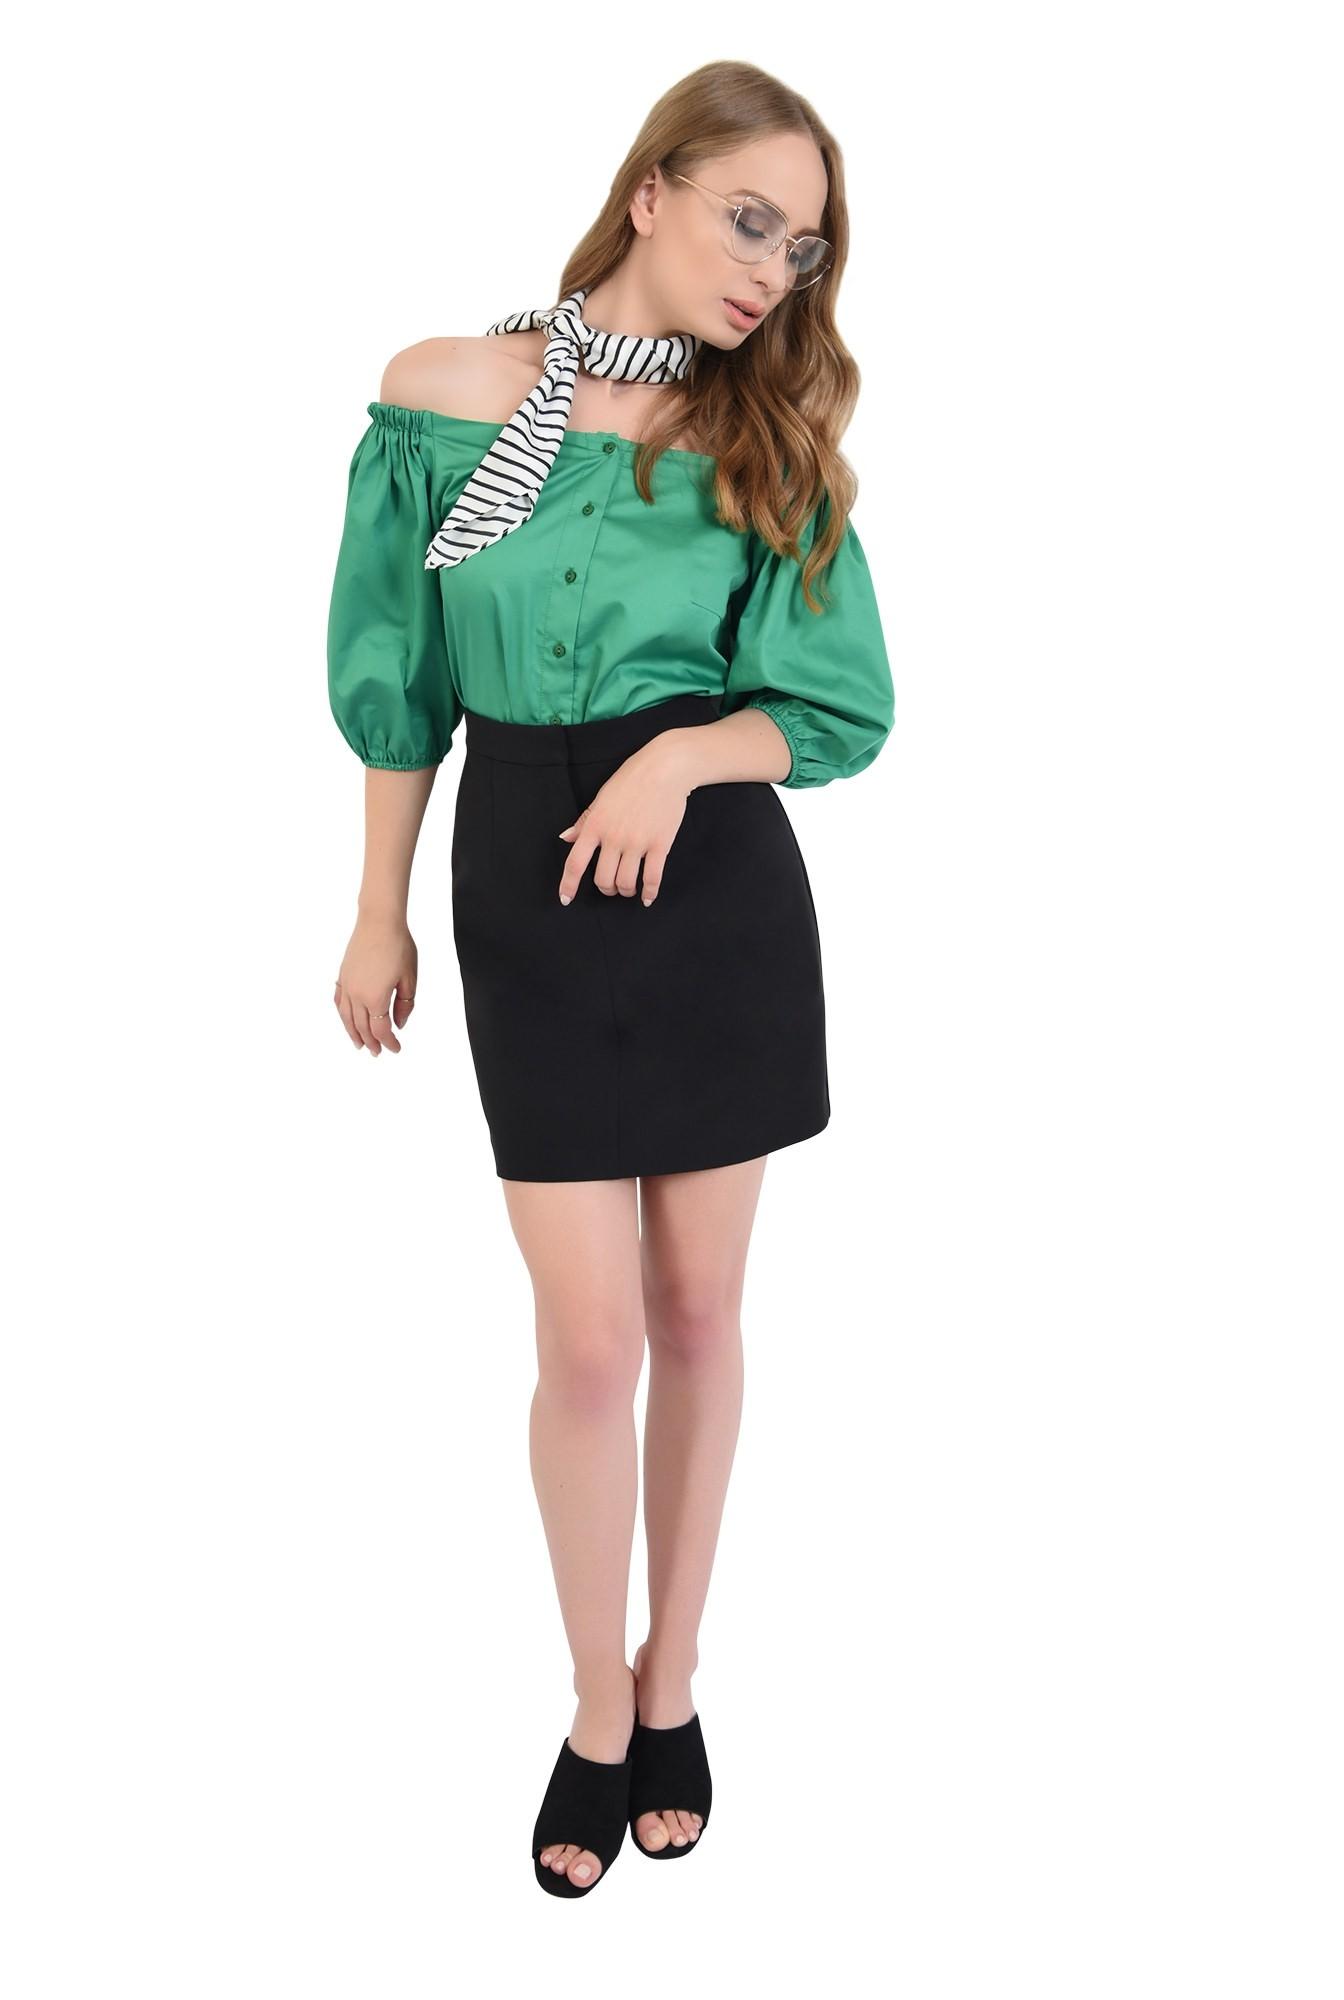 360 - bluza din bumbac, cu nasturi, verde, Poema